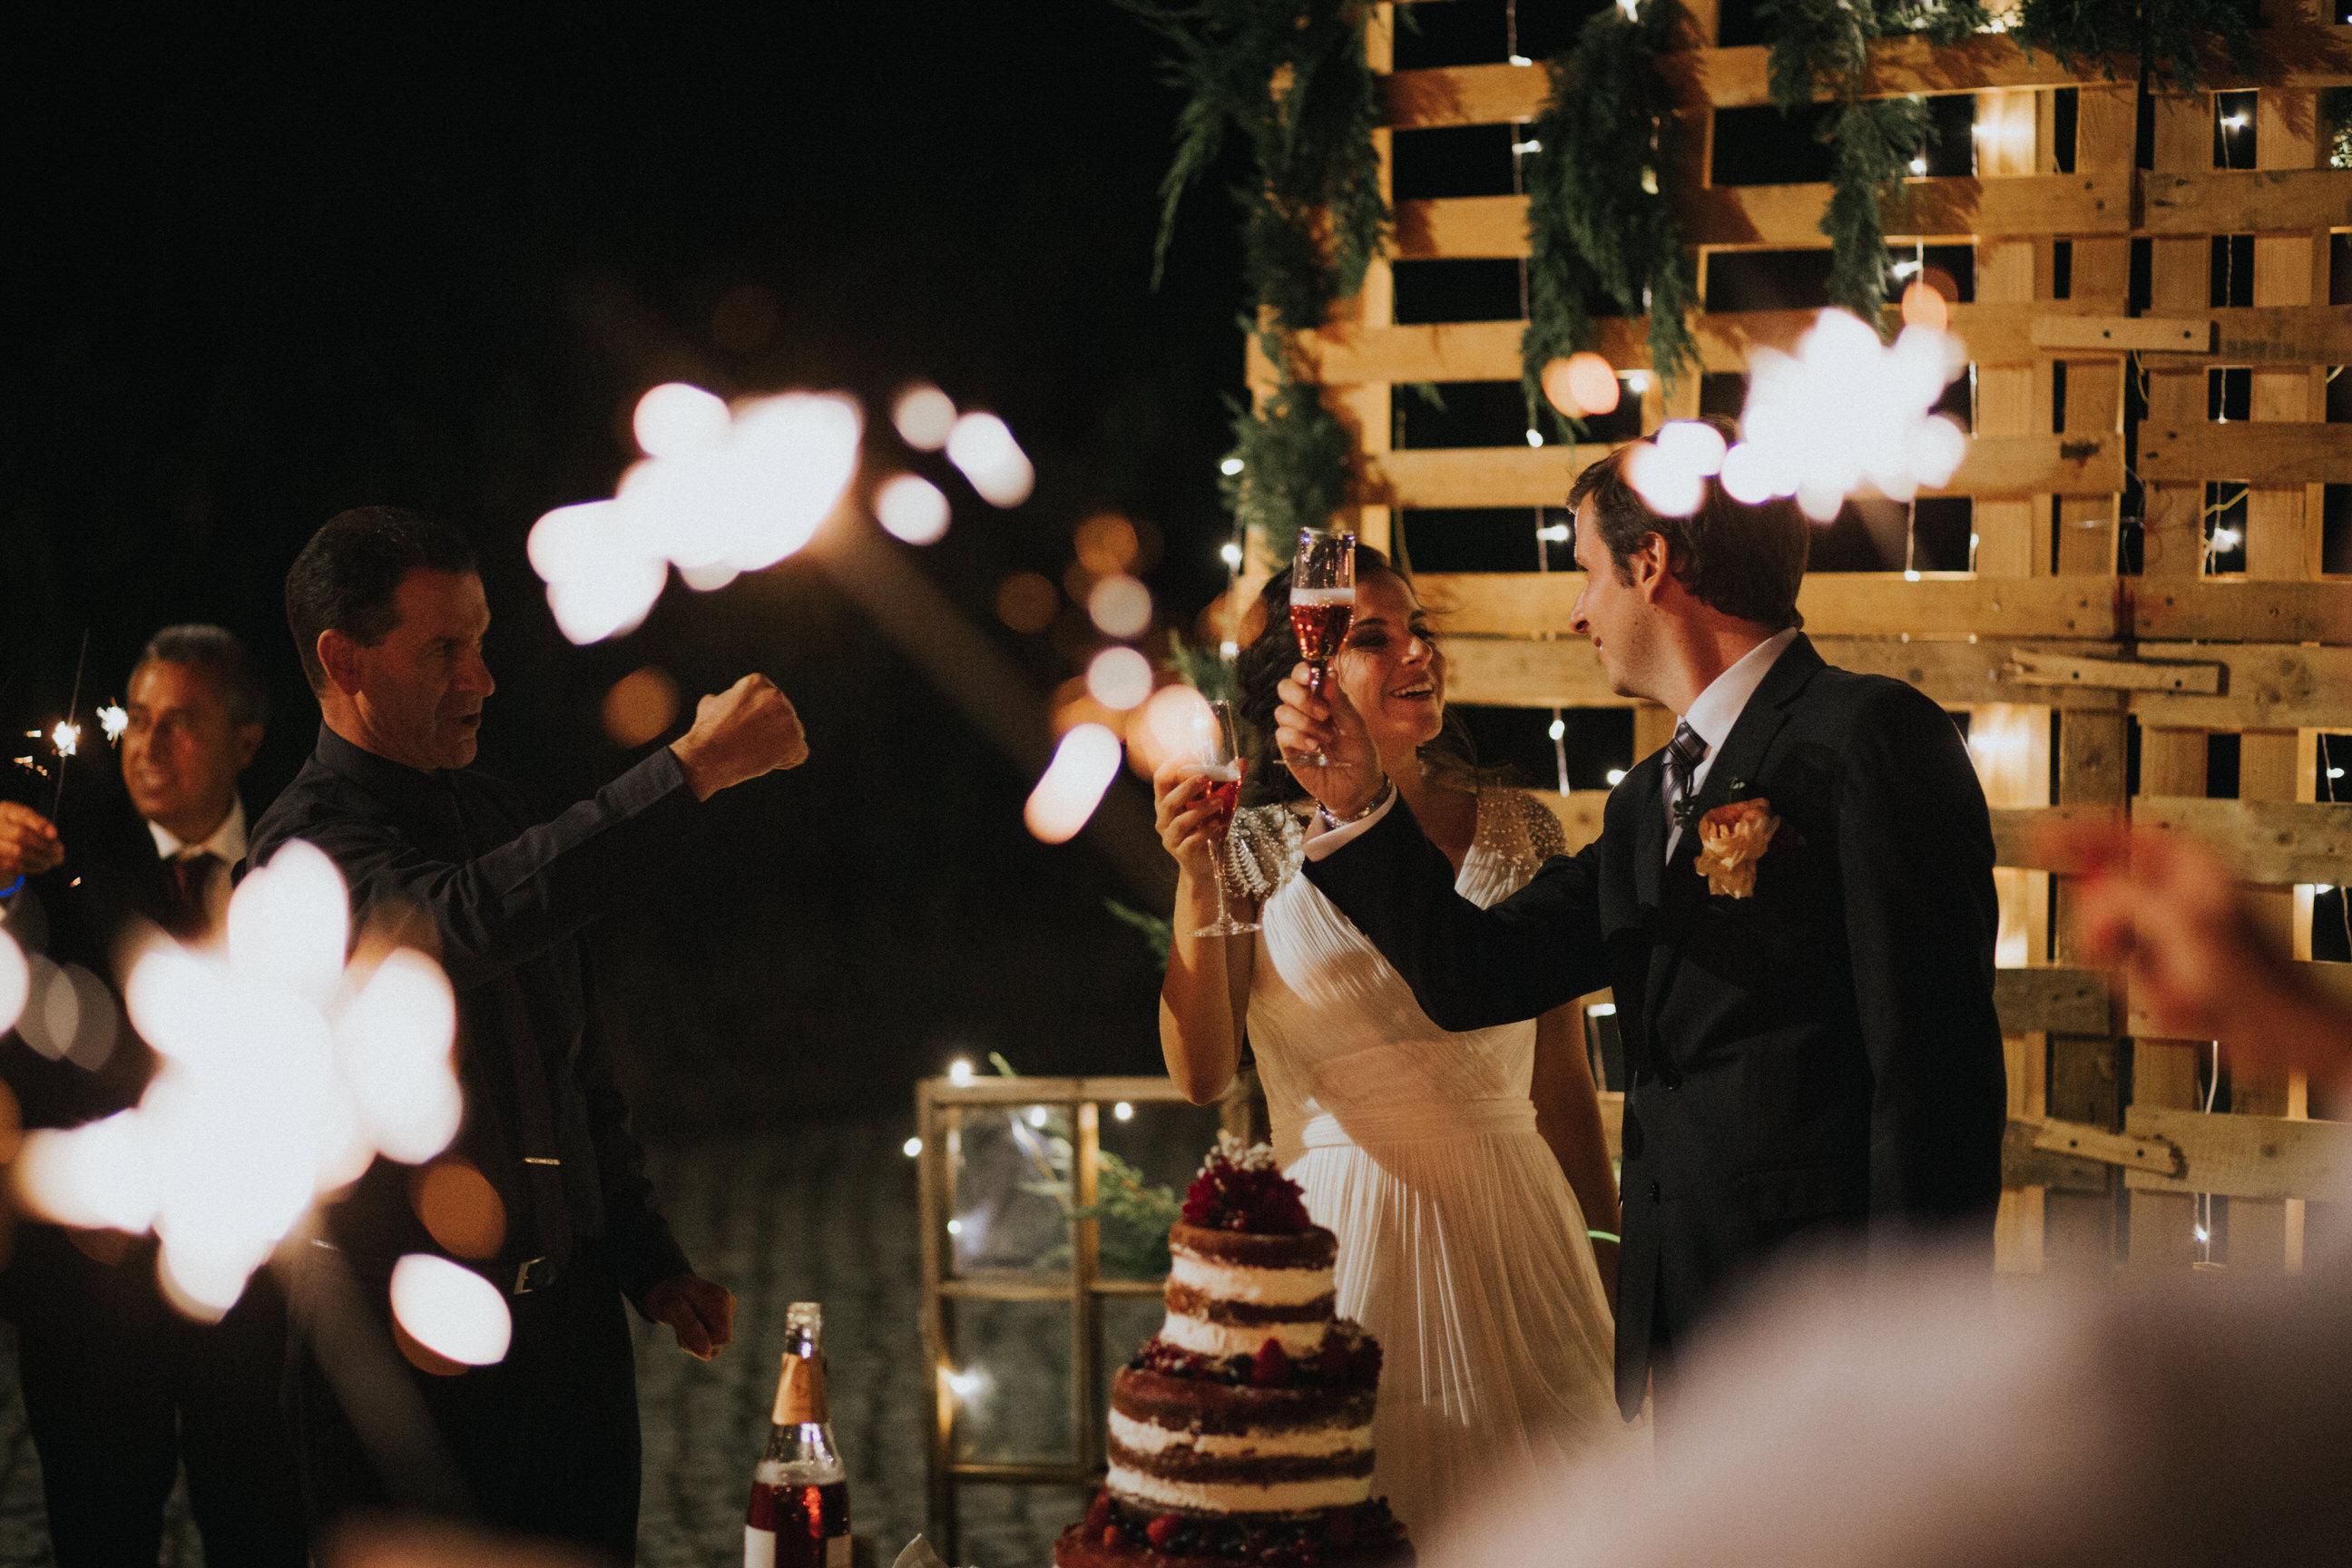 Casamento-Rustico-Bucelas-boho-chic-vestidos-dress-venue-Portugal-wedding-decor-cerimonia-quintas-perto-de-lisboa-fotografos-lisboa-ideas-session-vineyard-melhores-fotografos-portugal-wedding-cake-bolo de casamento-abertura-noivos-